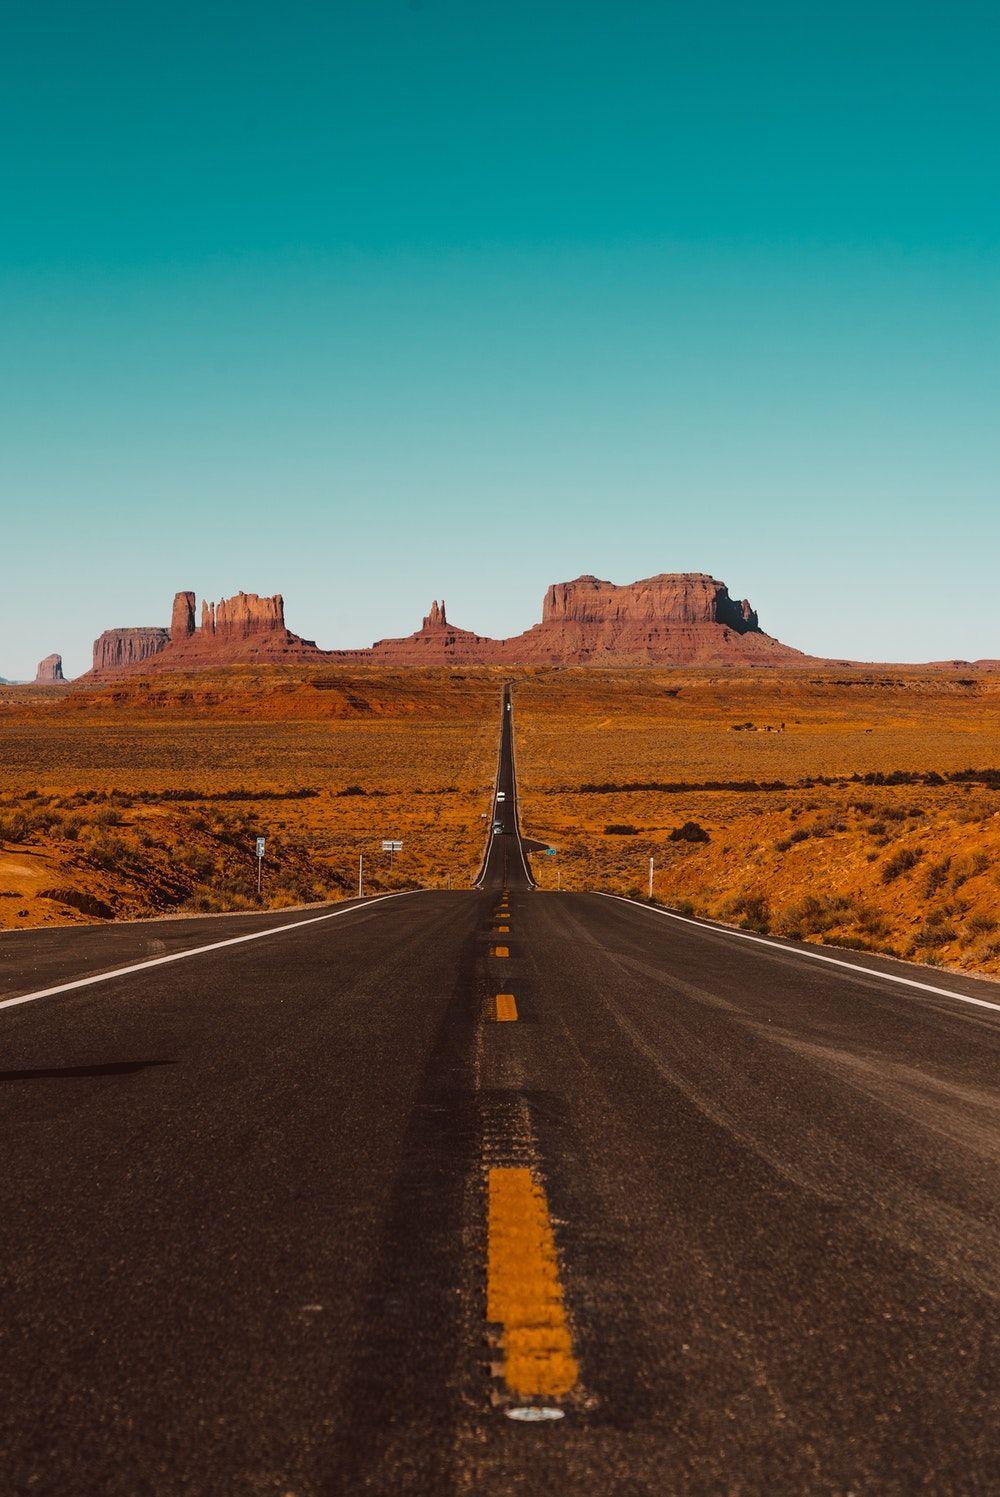 Road Trip Wallpapers